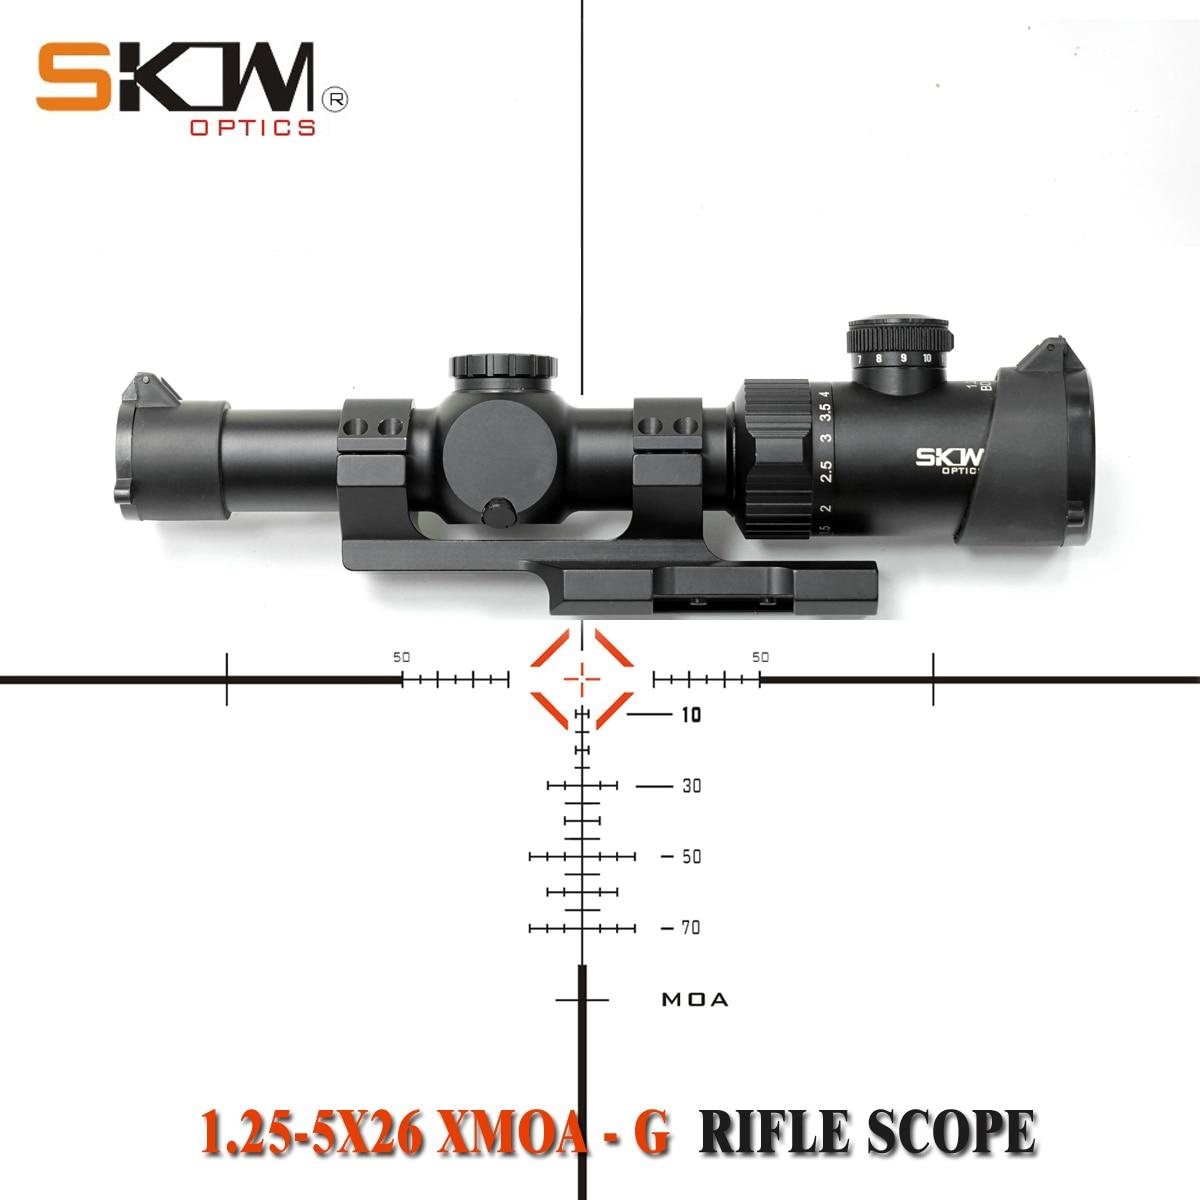 SKWoptics 1.25-5x26 XMOA-G Tactical riflescopes Hunting AK AR M4 sight compact rifle scope MOA reticle  new 30 scope rings